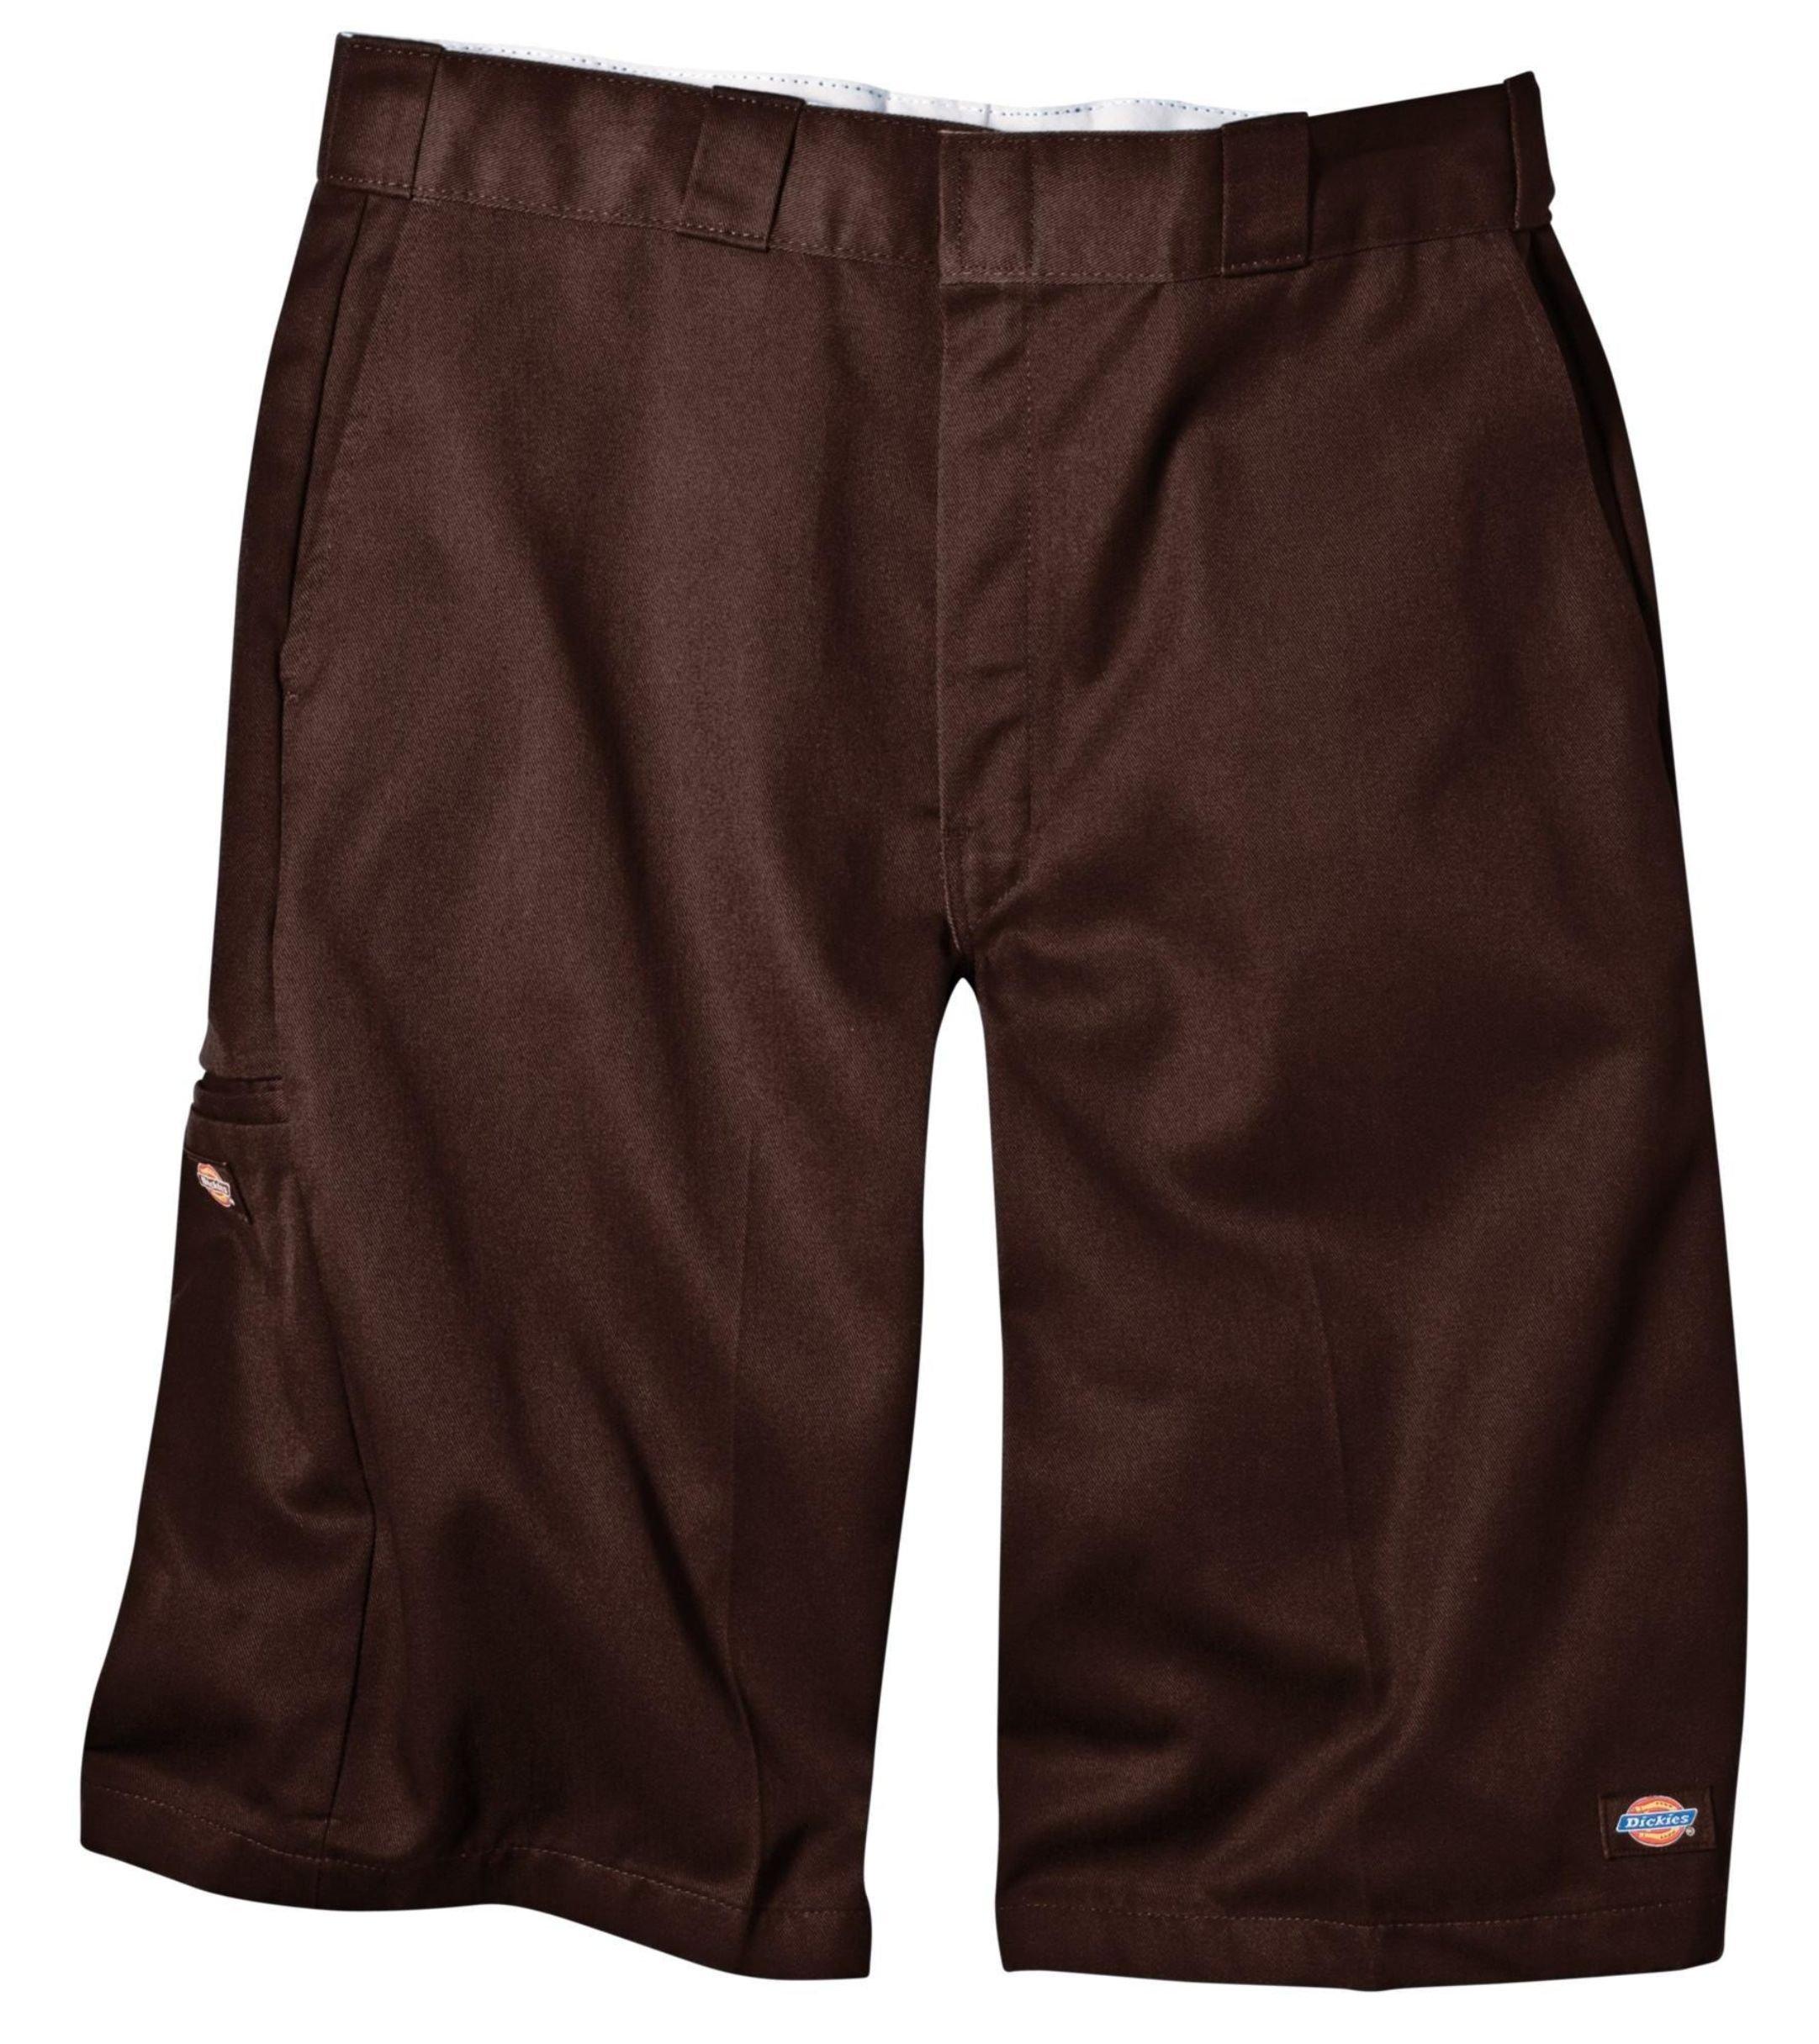 Dickies Men's 13 Inch Loose Fit Multi-Pocket Work Short, Dark Brown, 40